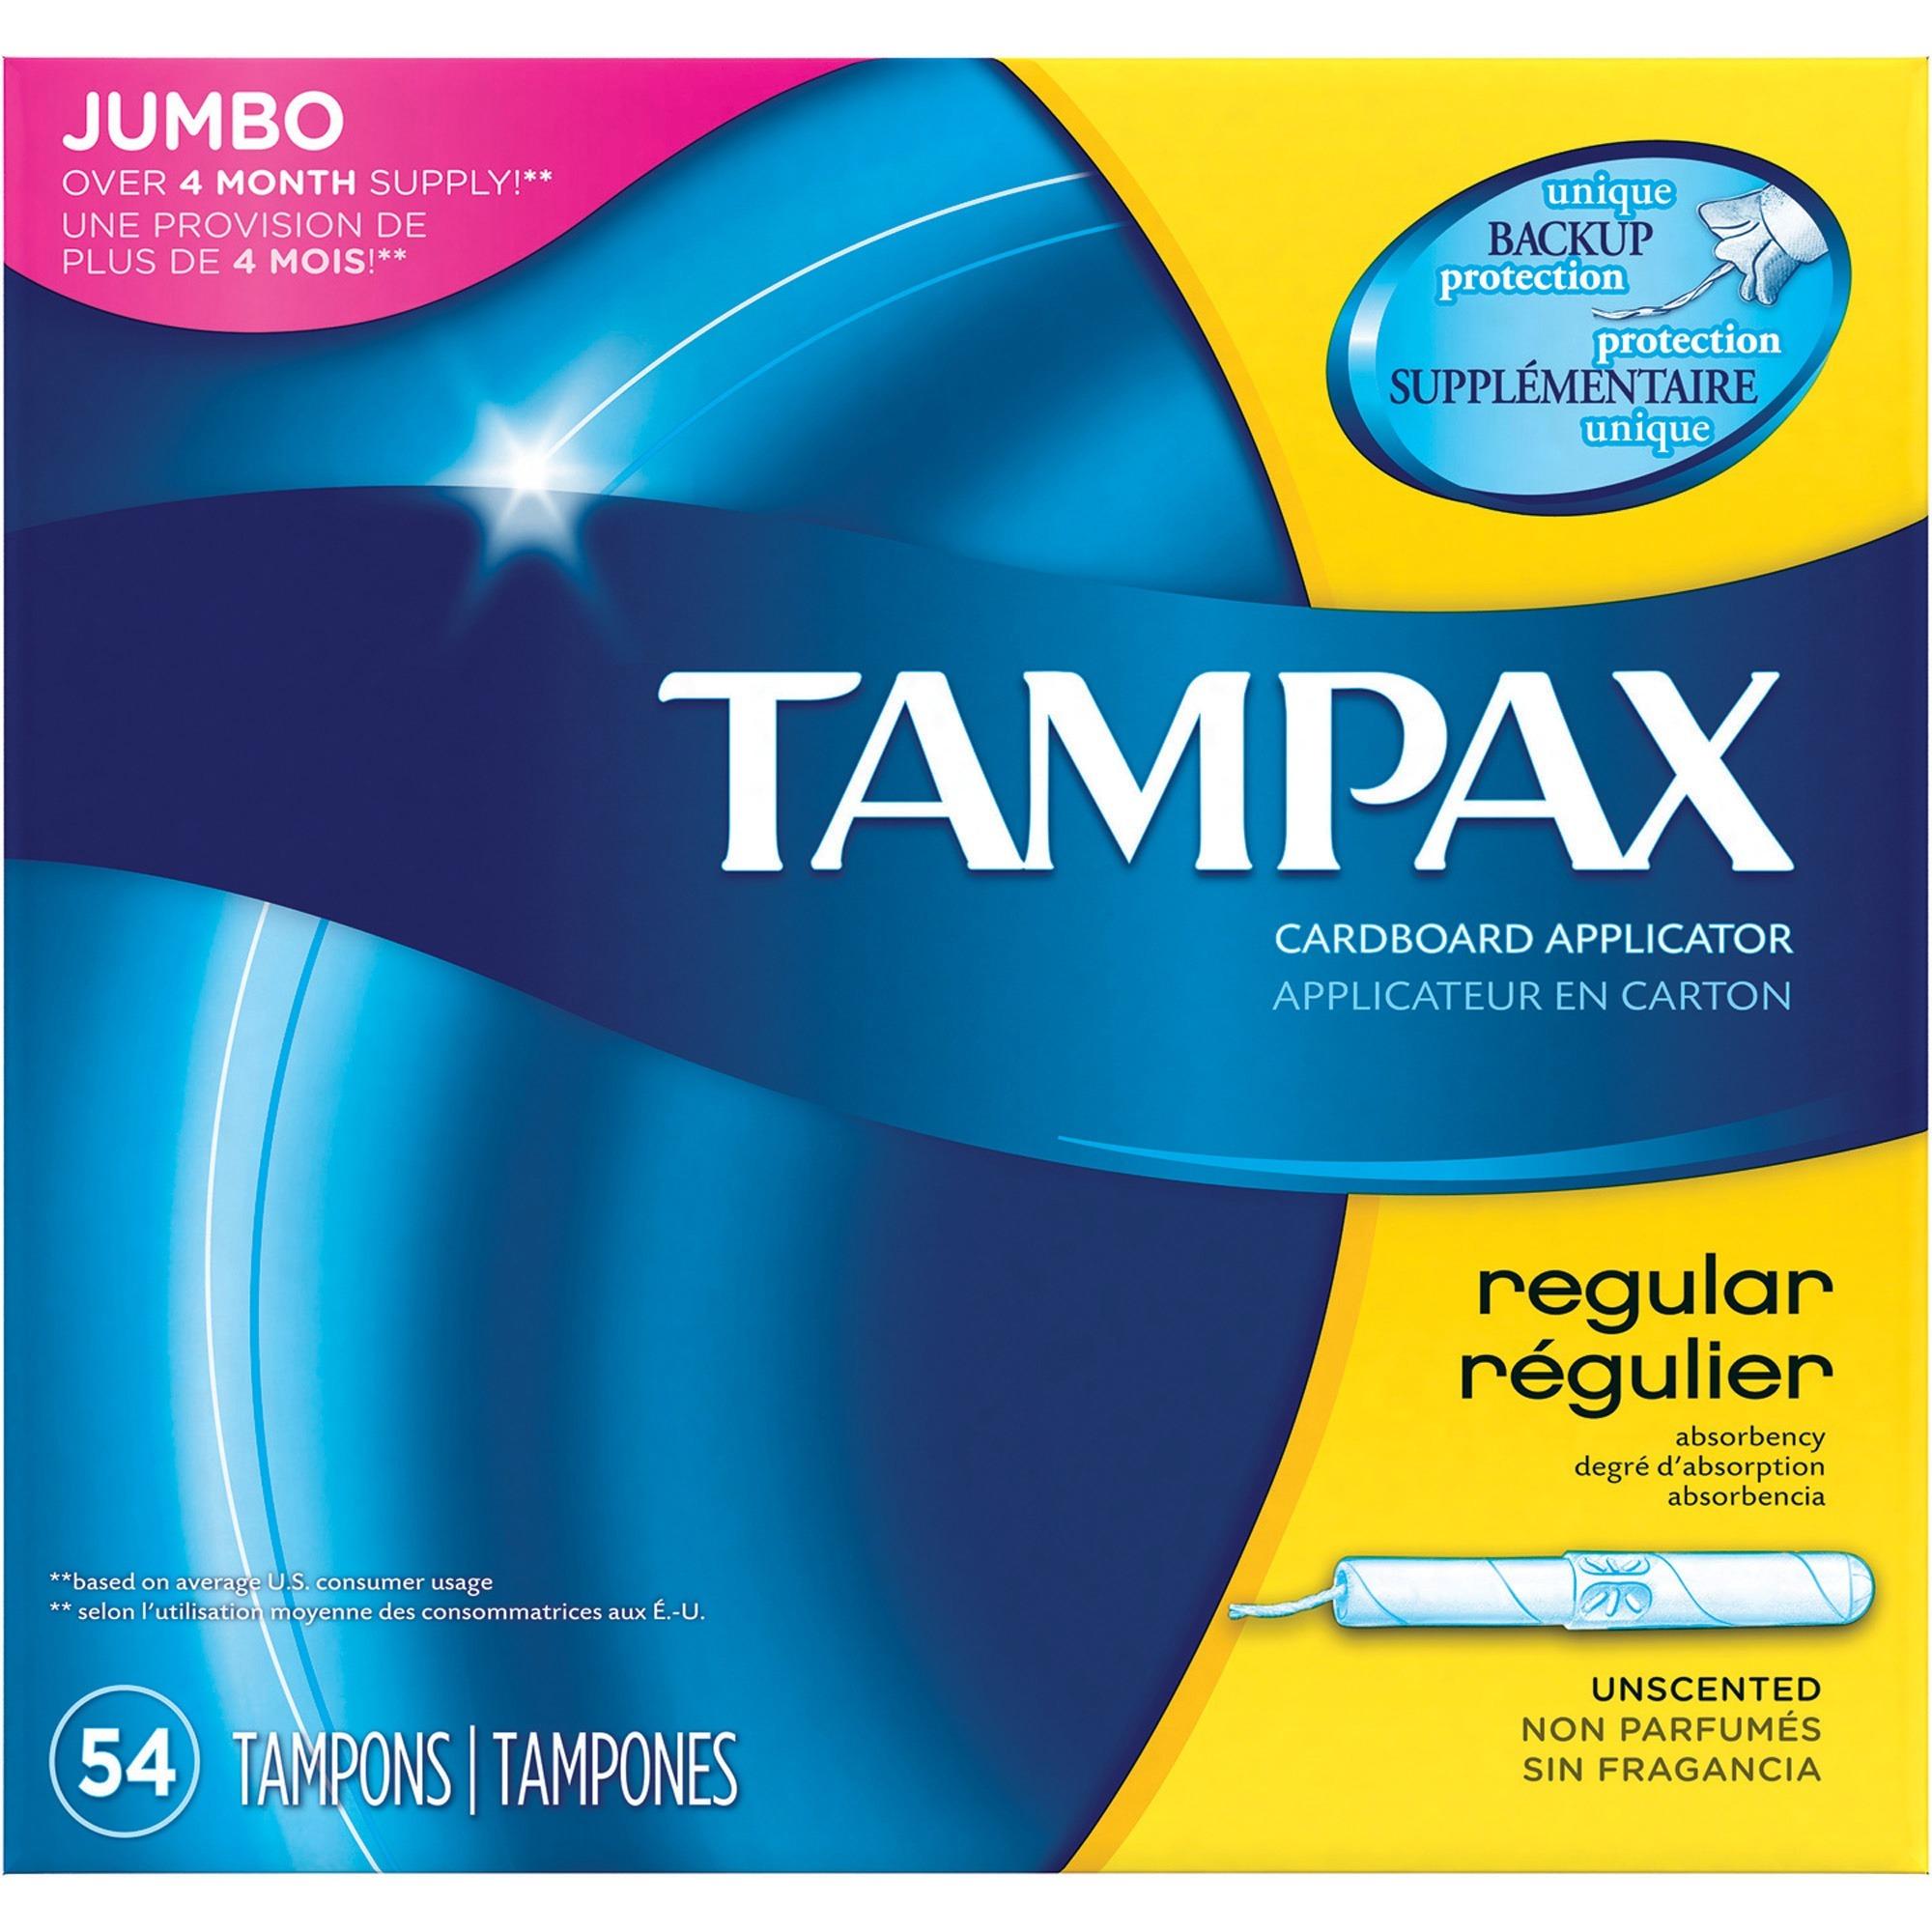 Tampax Tampons - 54 / Box - Flushable, Individually Wrapped,  Fragrance-free, Anti-leak, Anti-slip